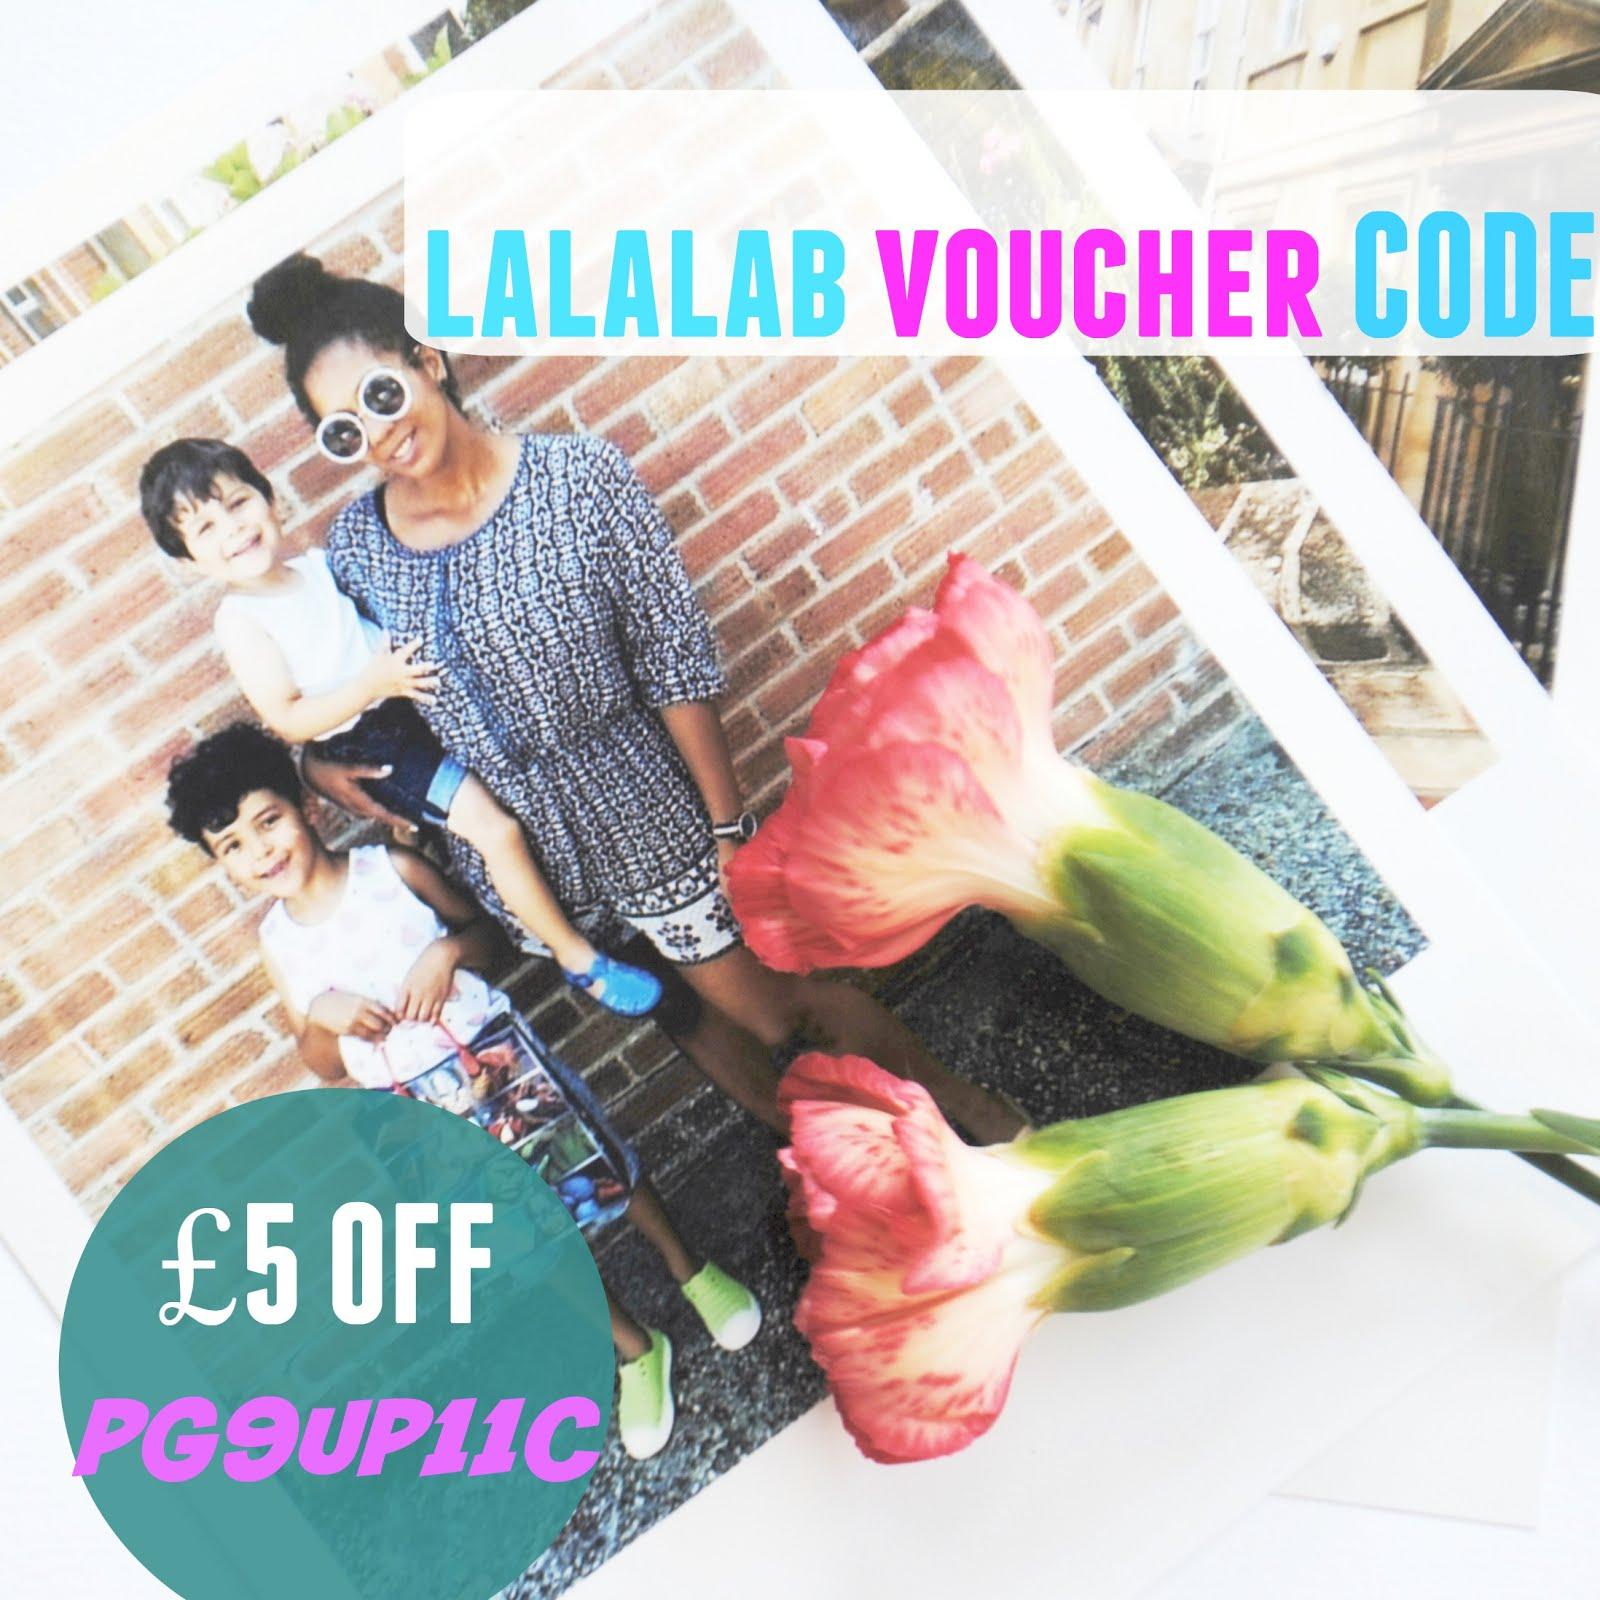 Lalalab Voucher